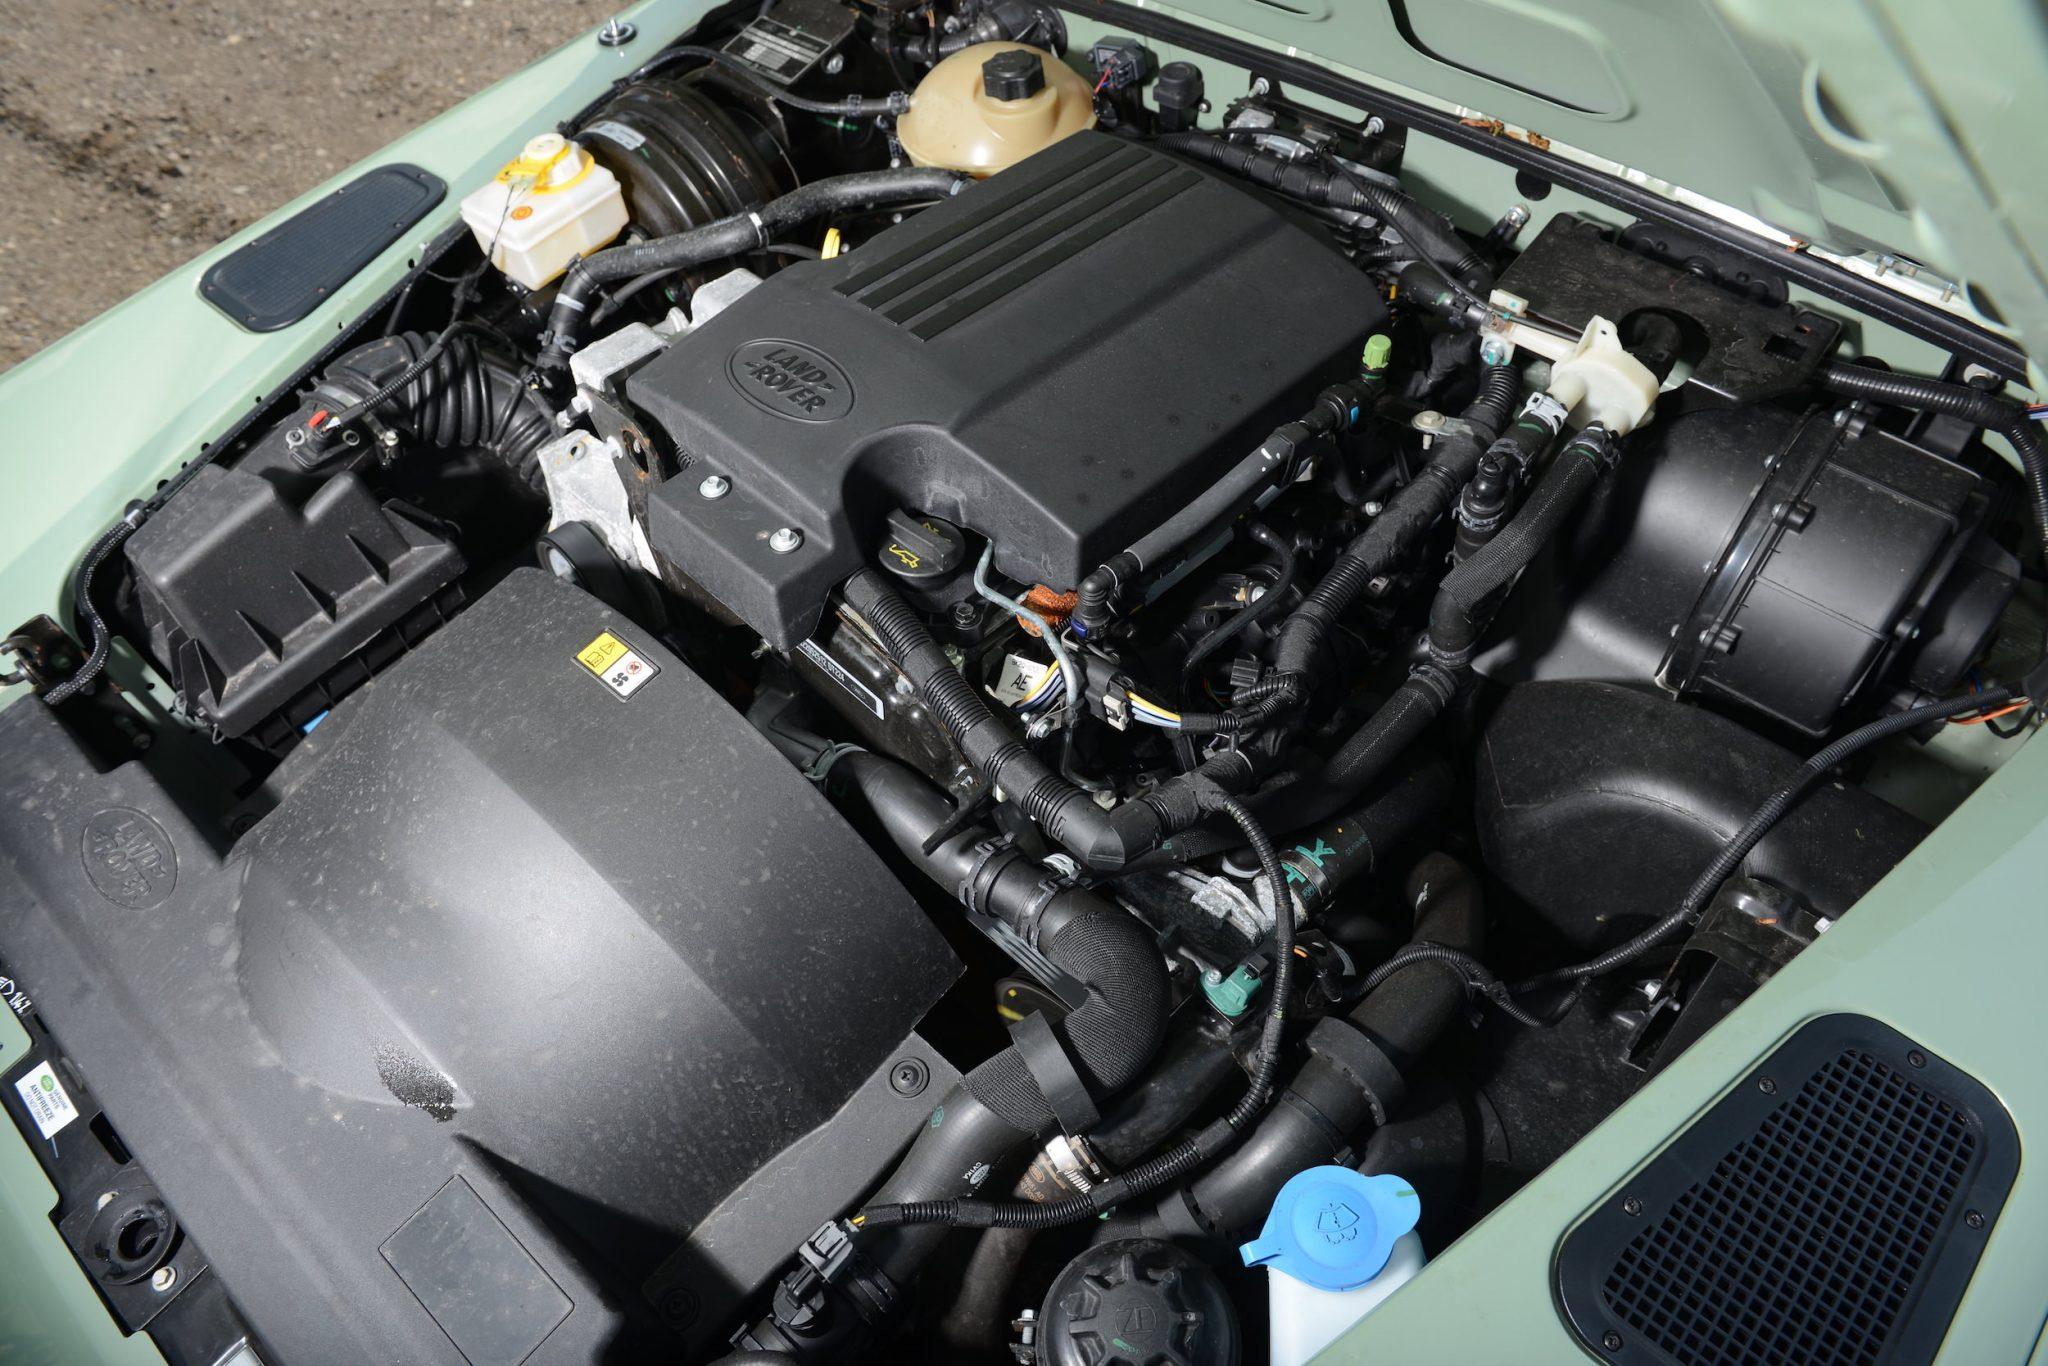 Rowan Atkinson's Land Rover Defender 1 - Rowan Atkinson's Land Rover Defender